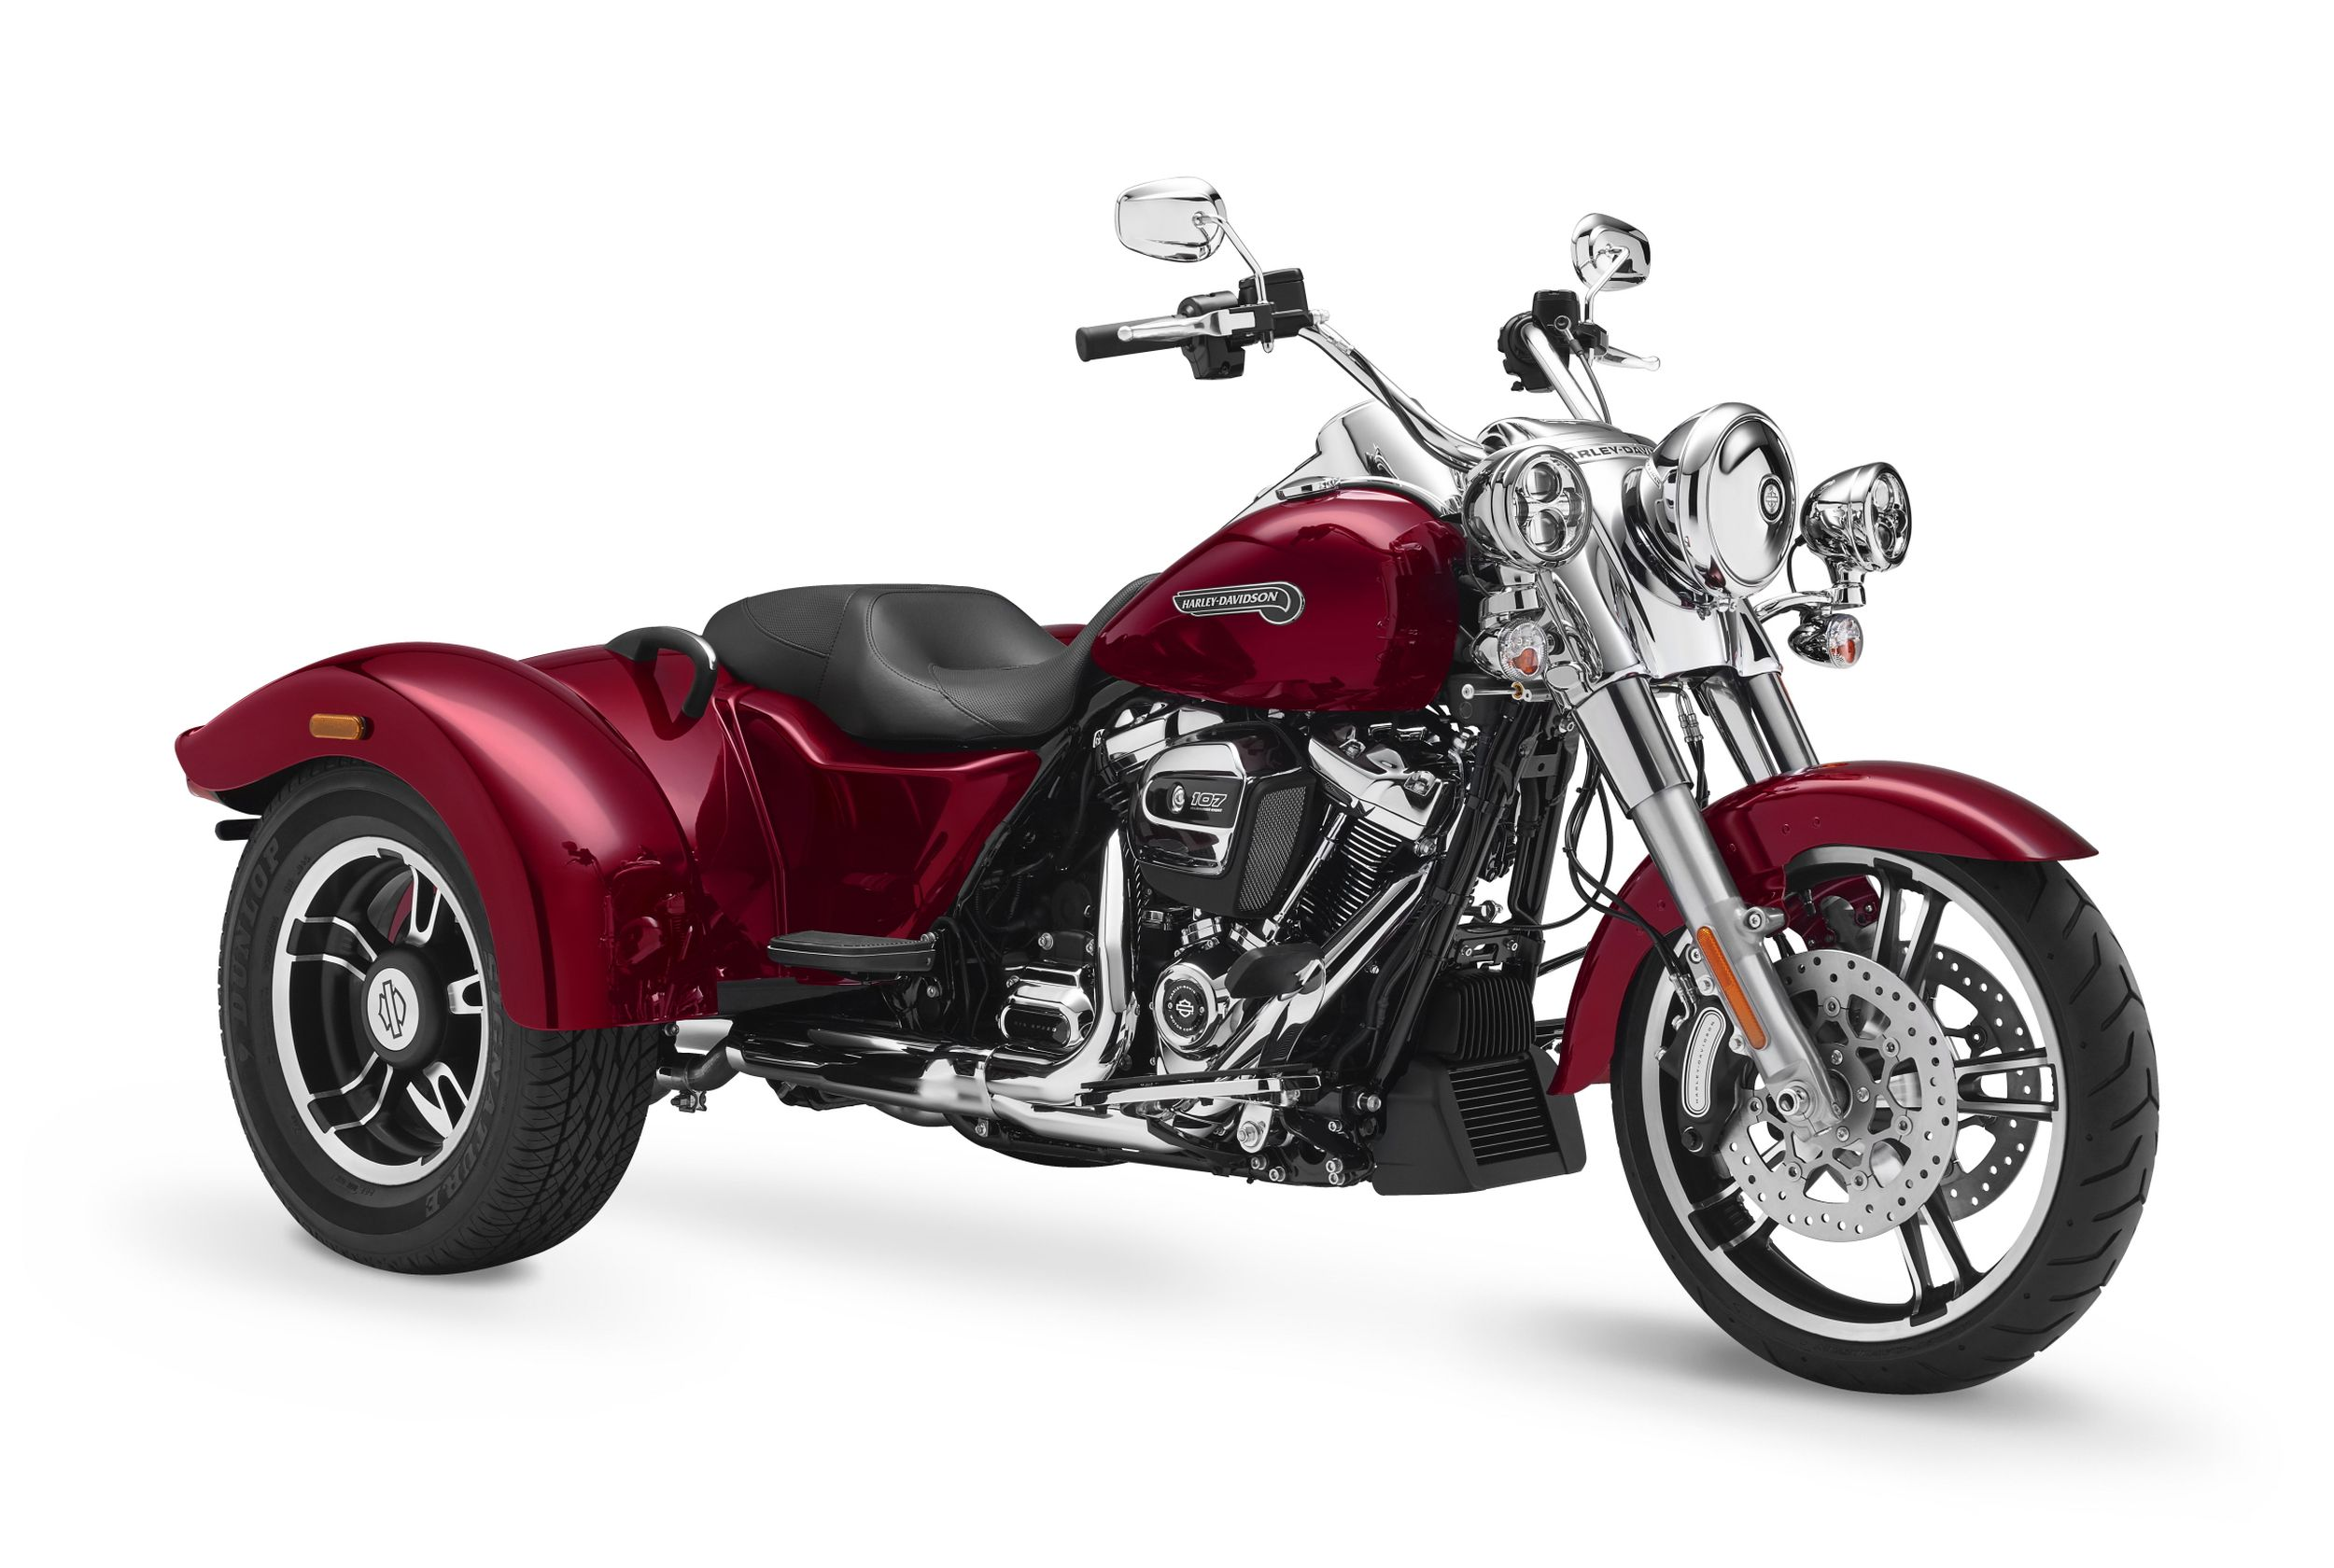 Harley Davidson Cvo Street Breakout